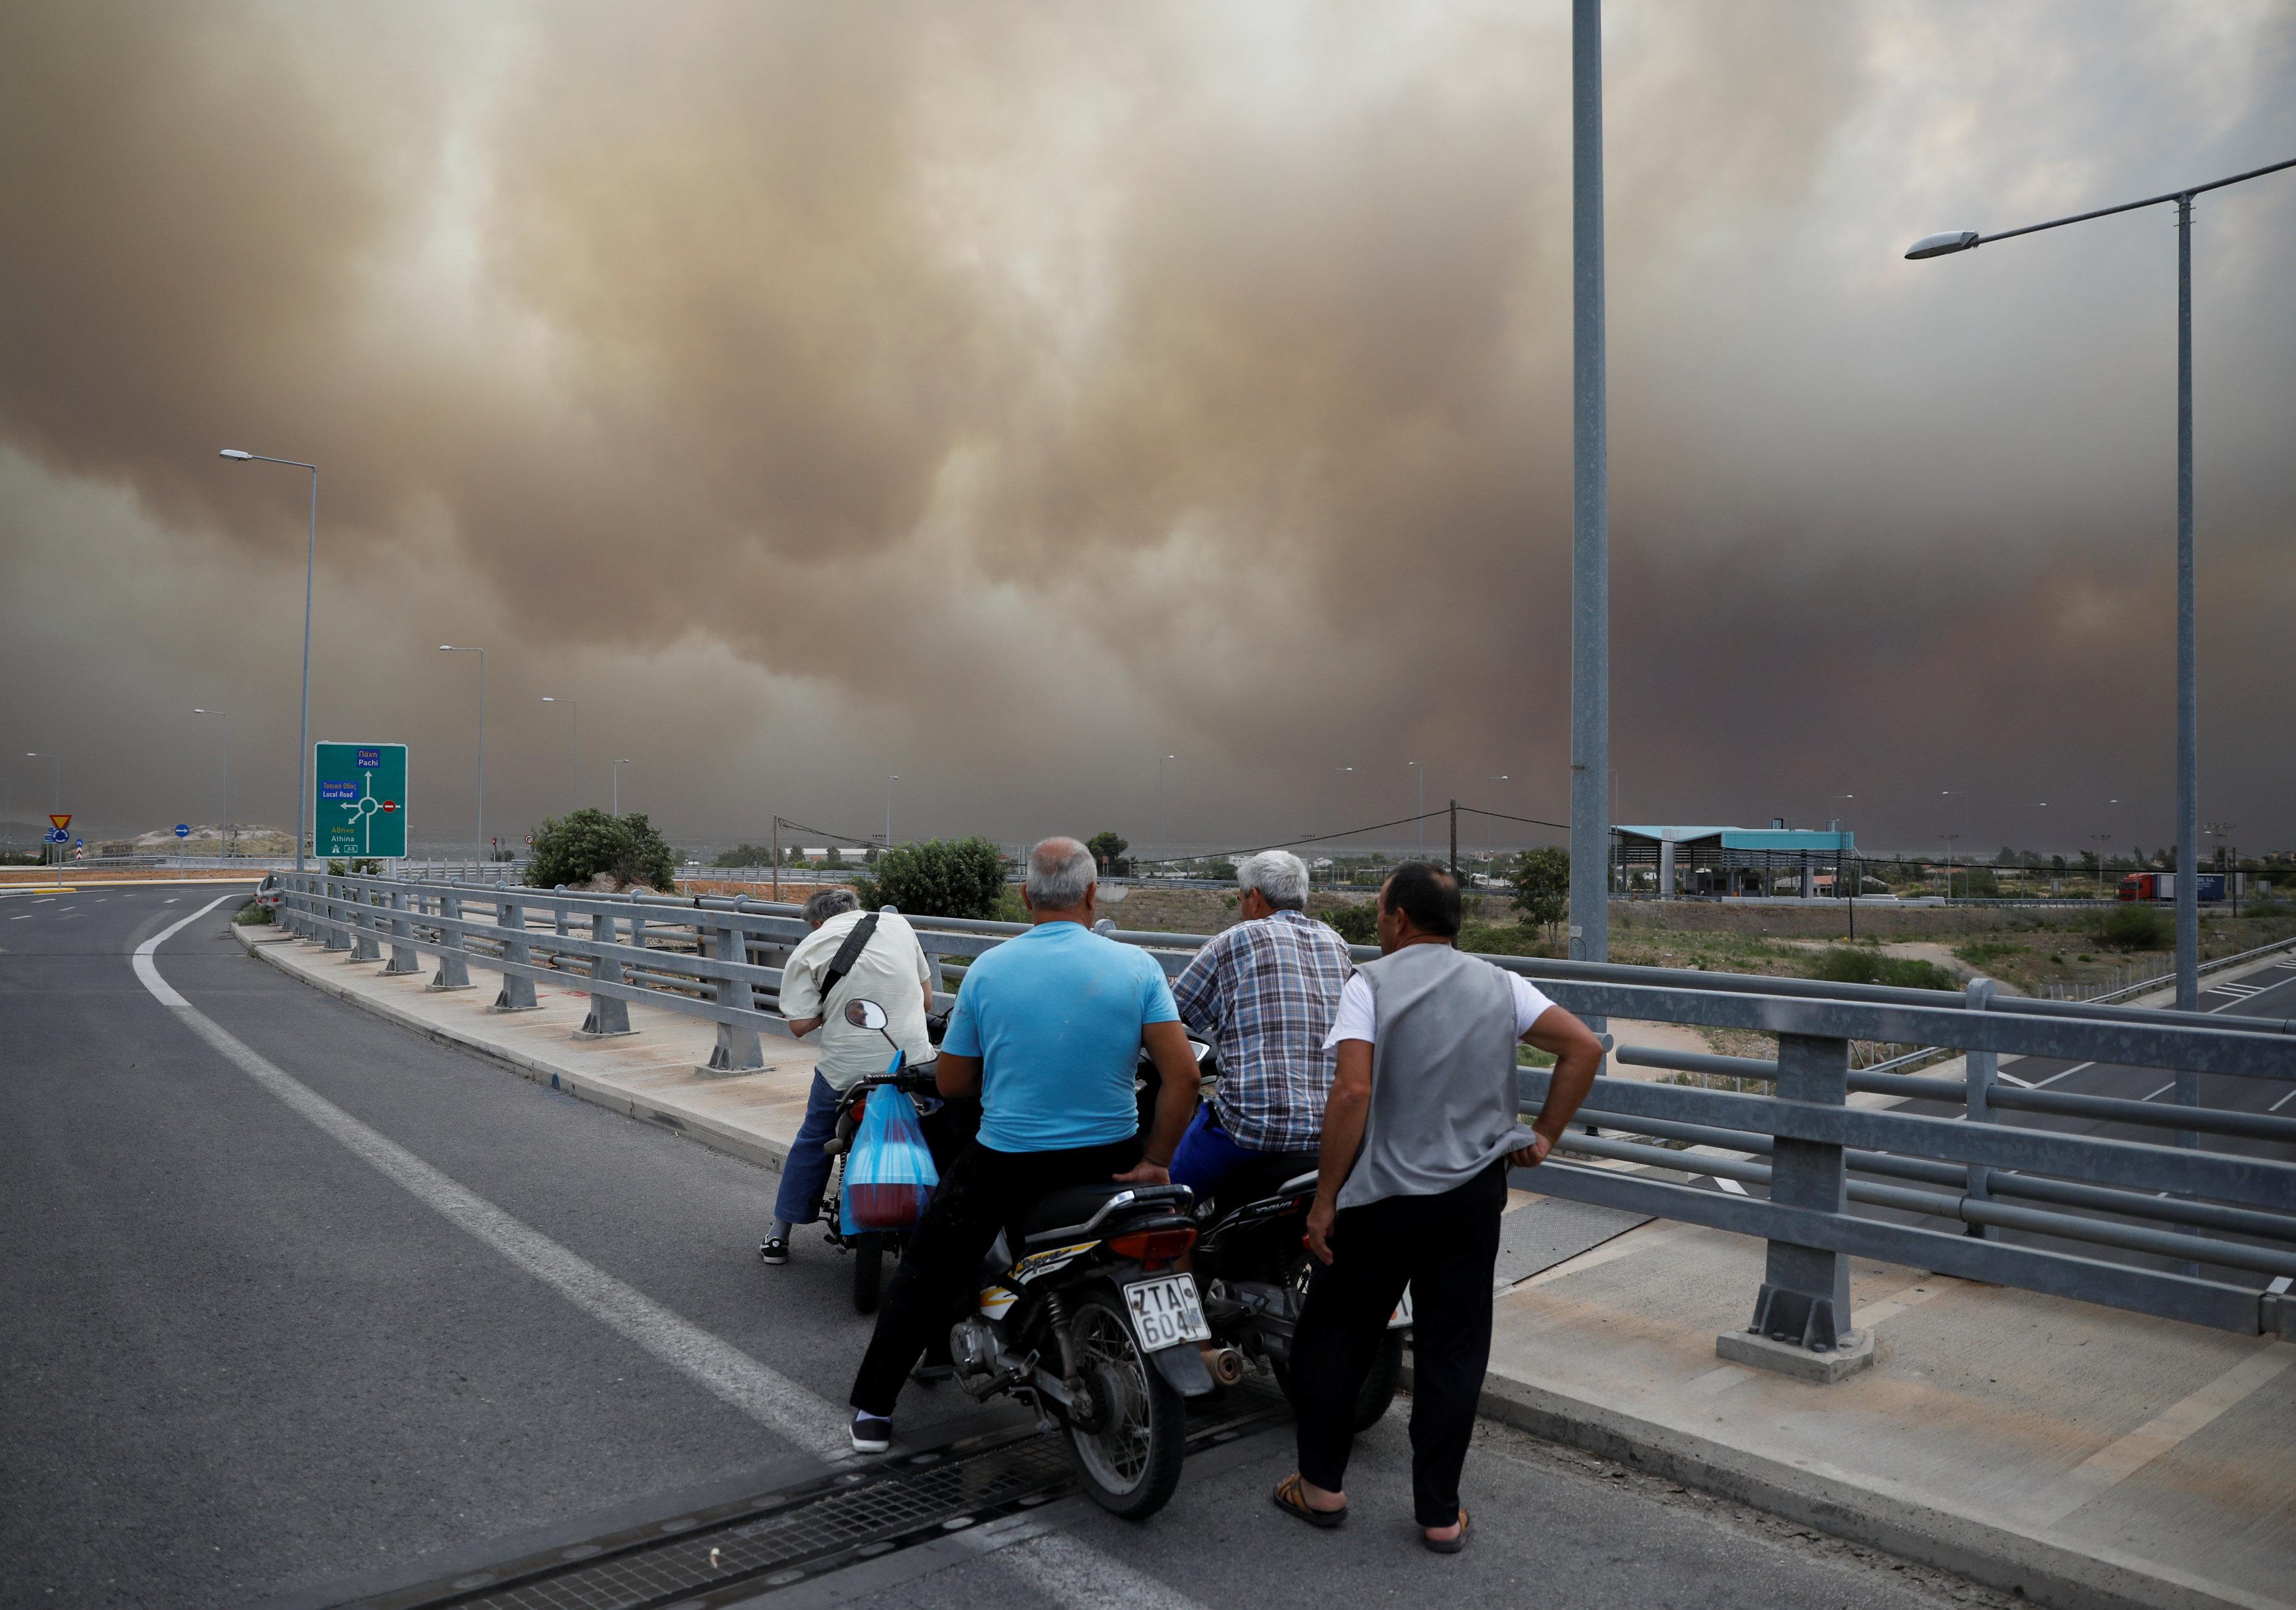 People look at smoke as a wildfire burns in Kineta